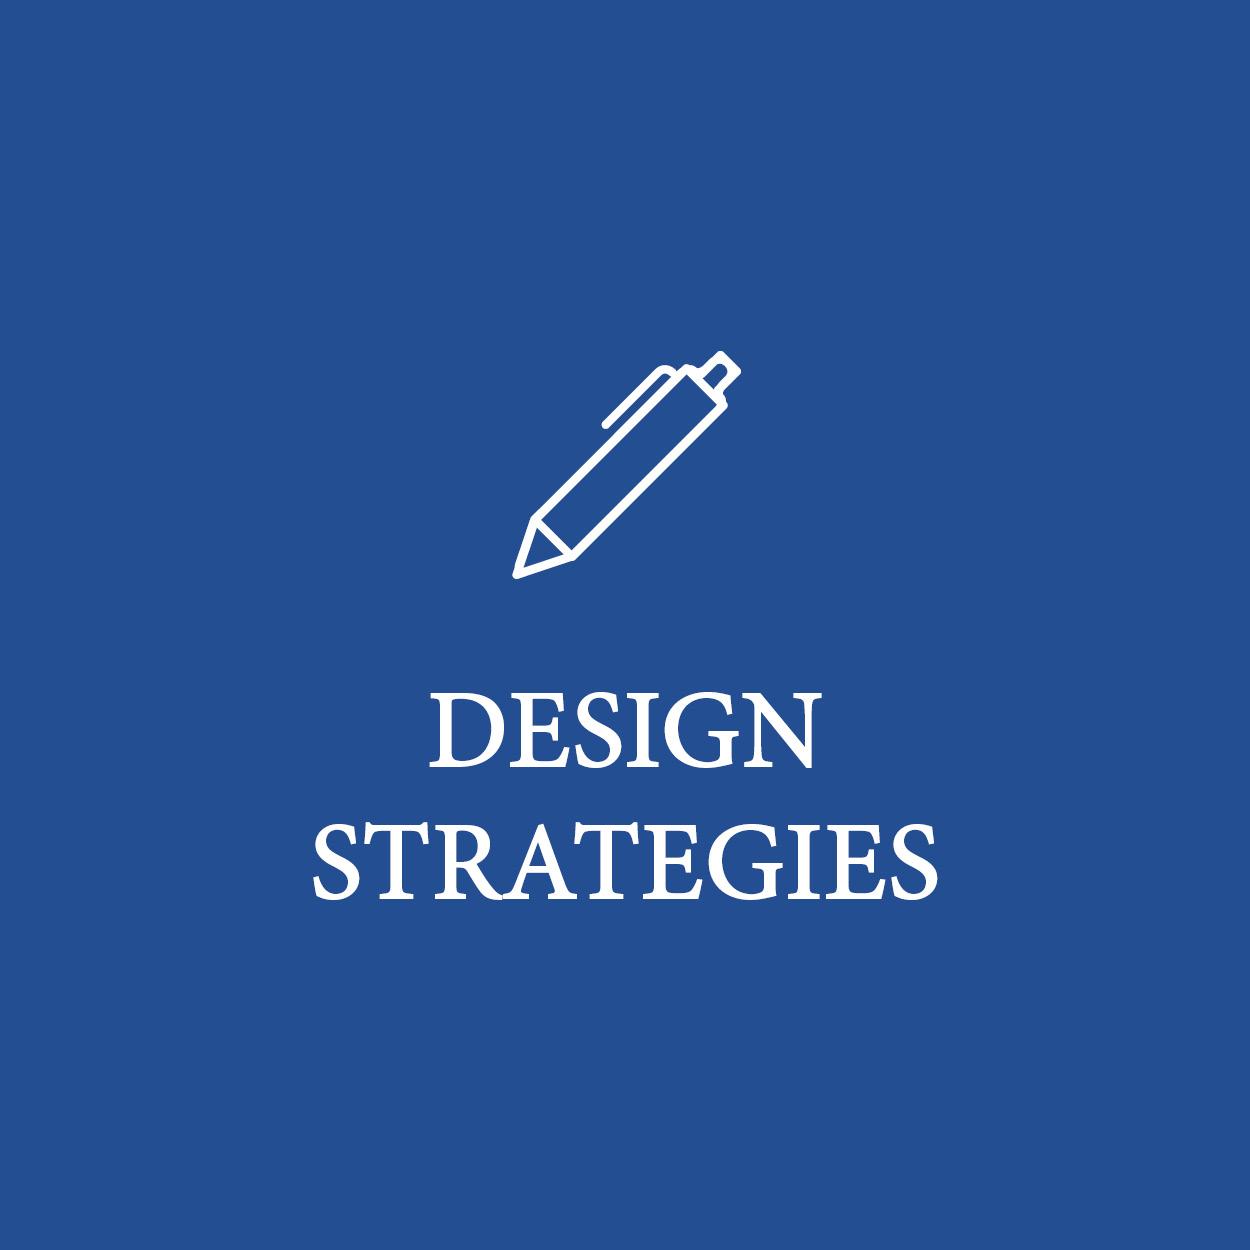 bettershoesfoundation_design_strategies